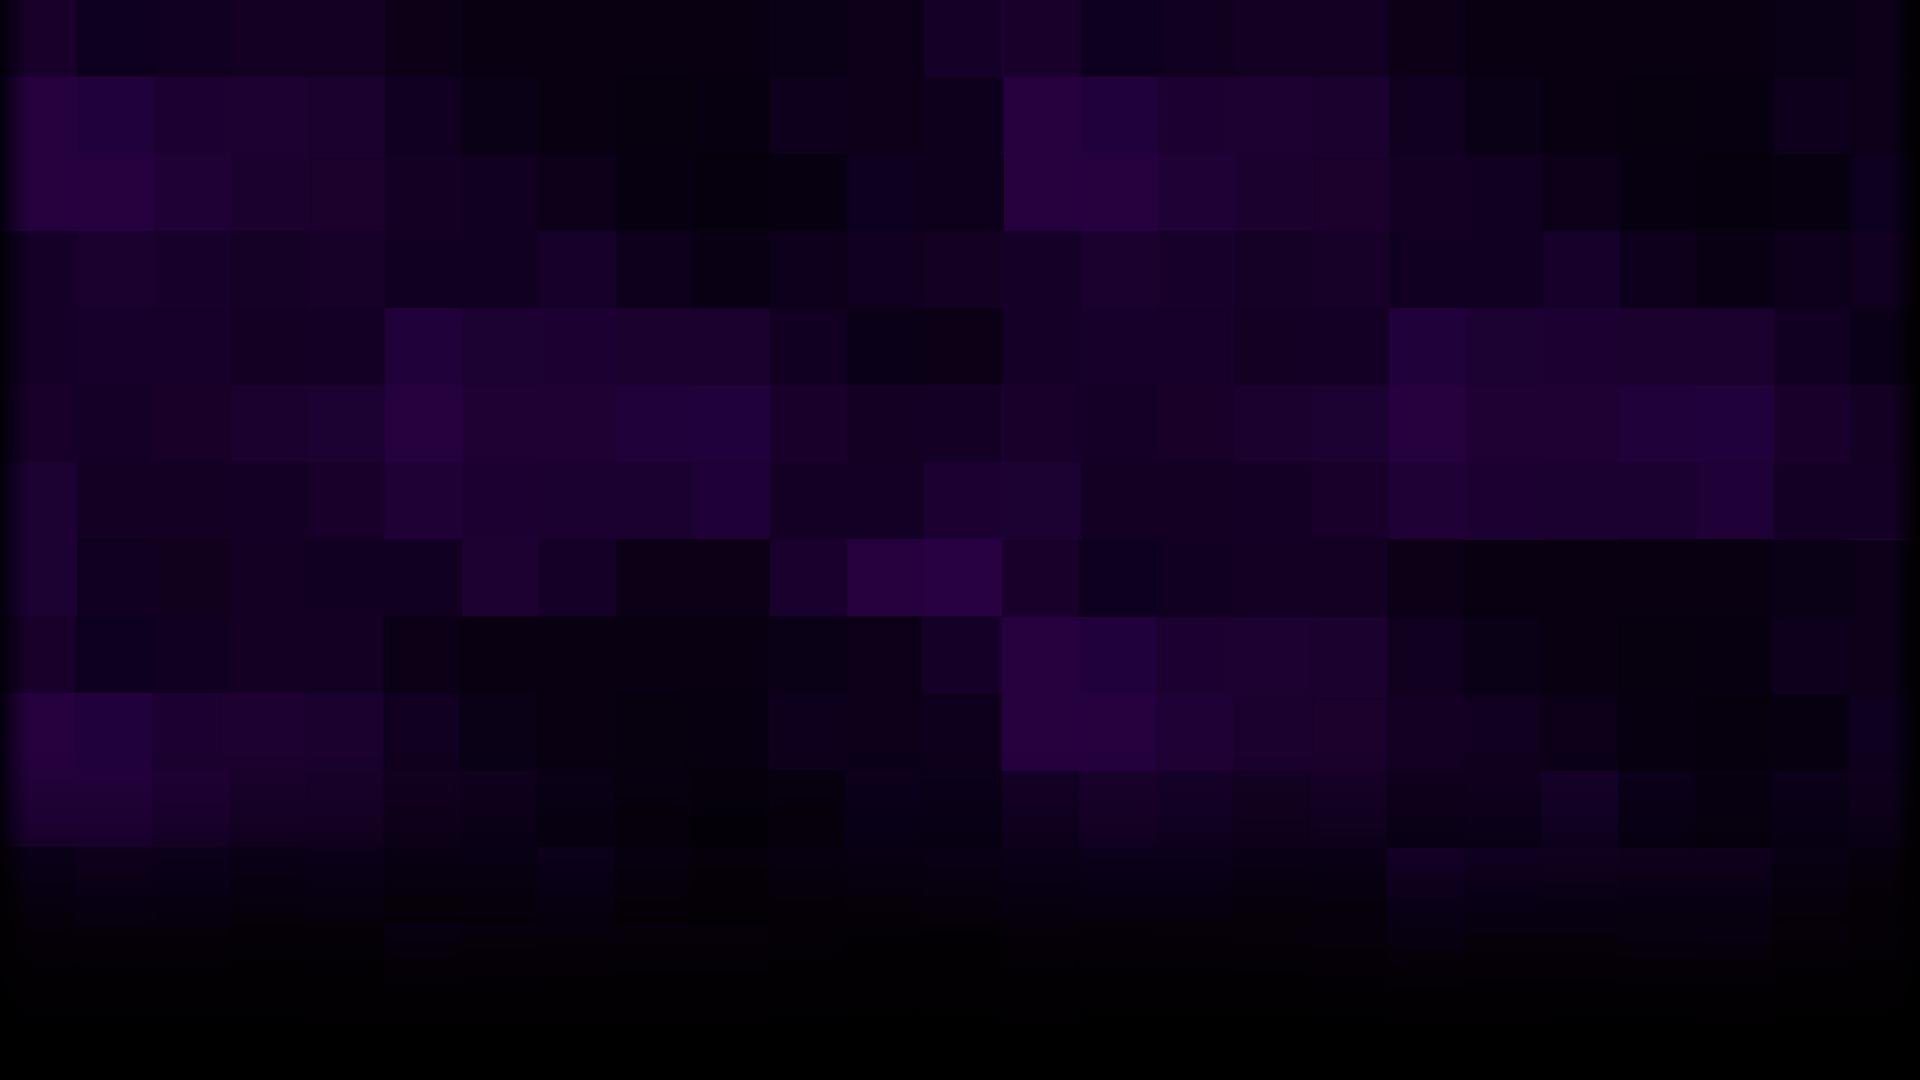 296870-Purple Haze